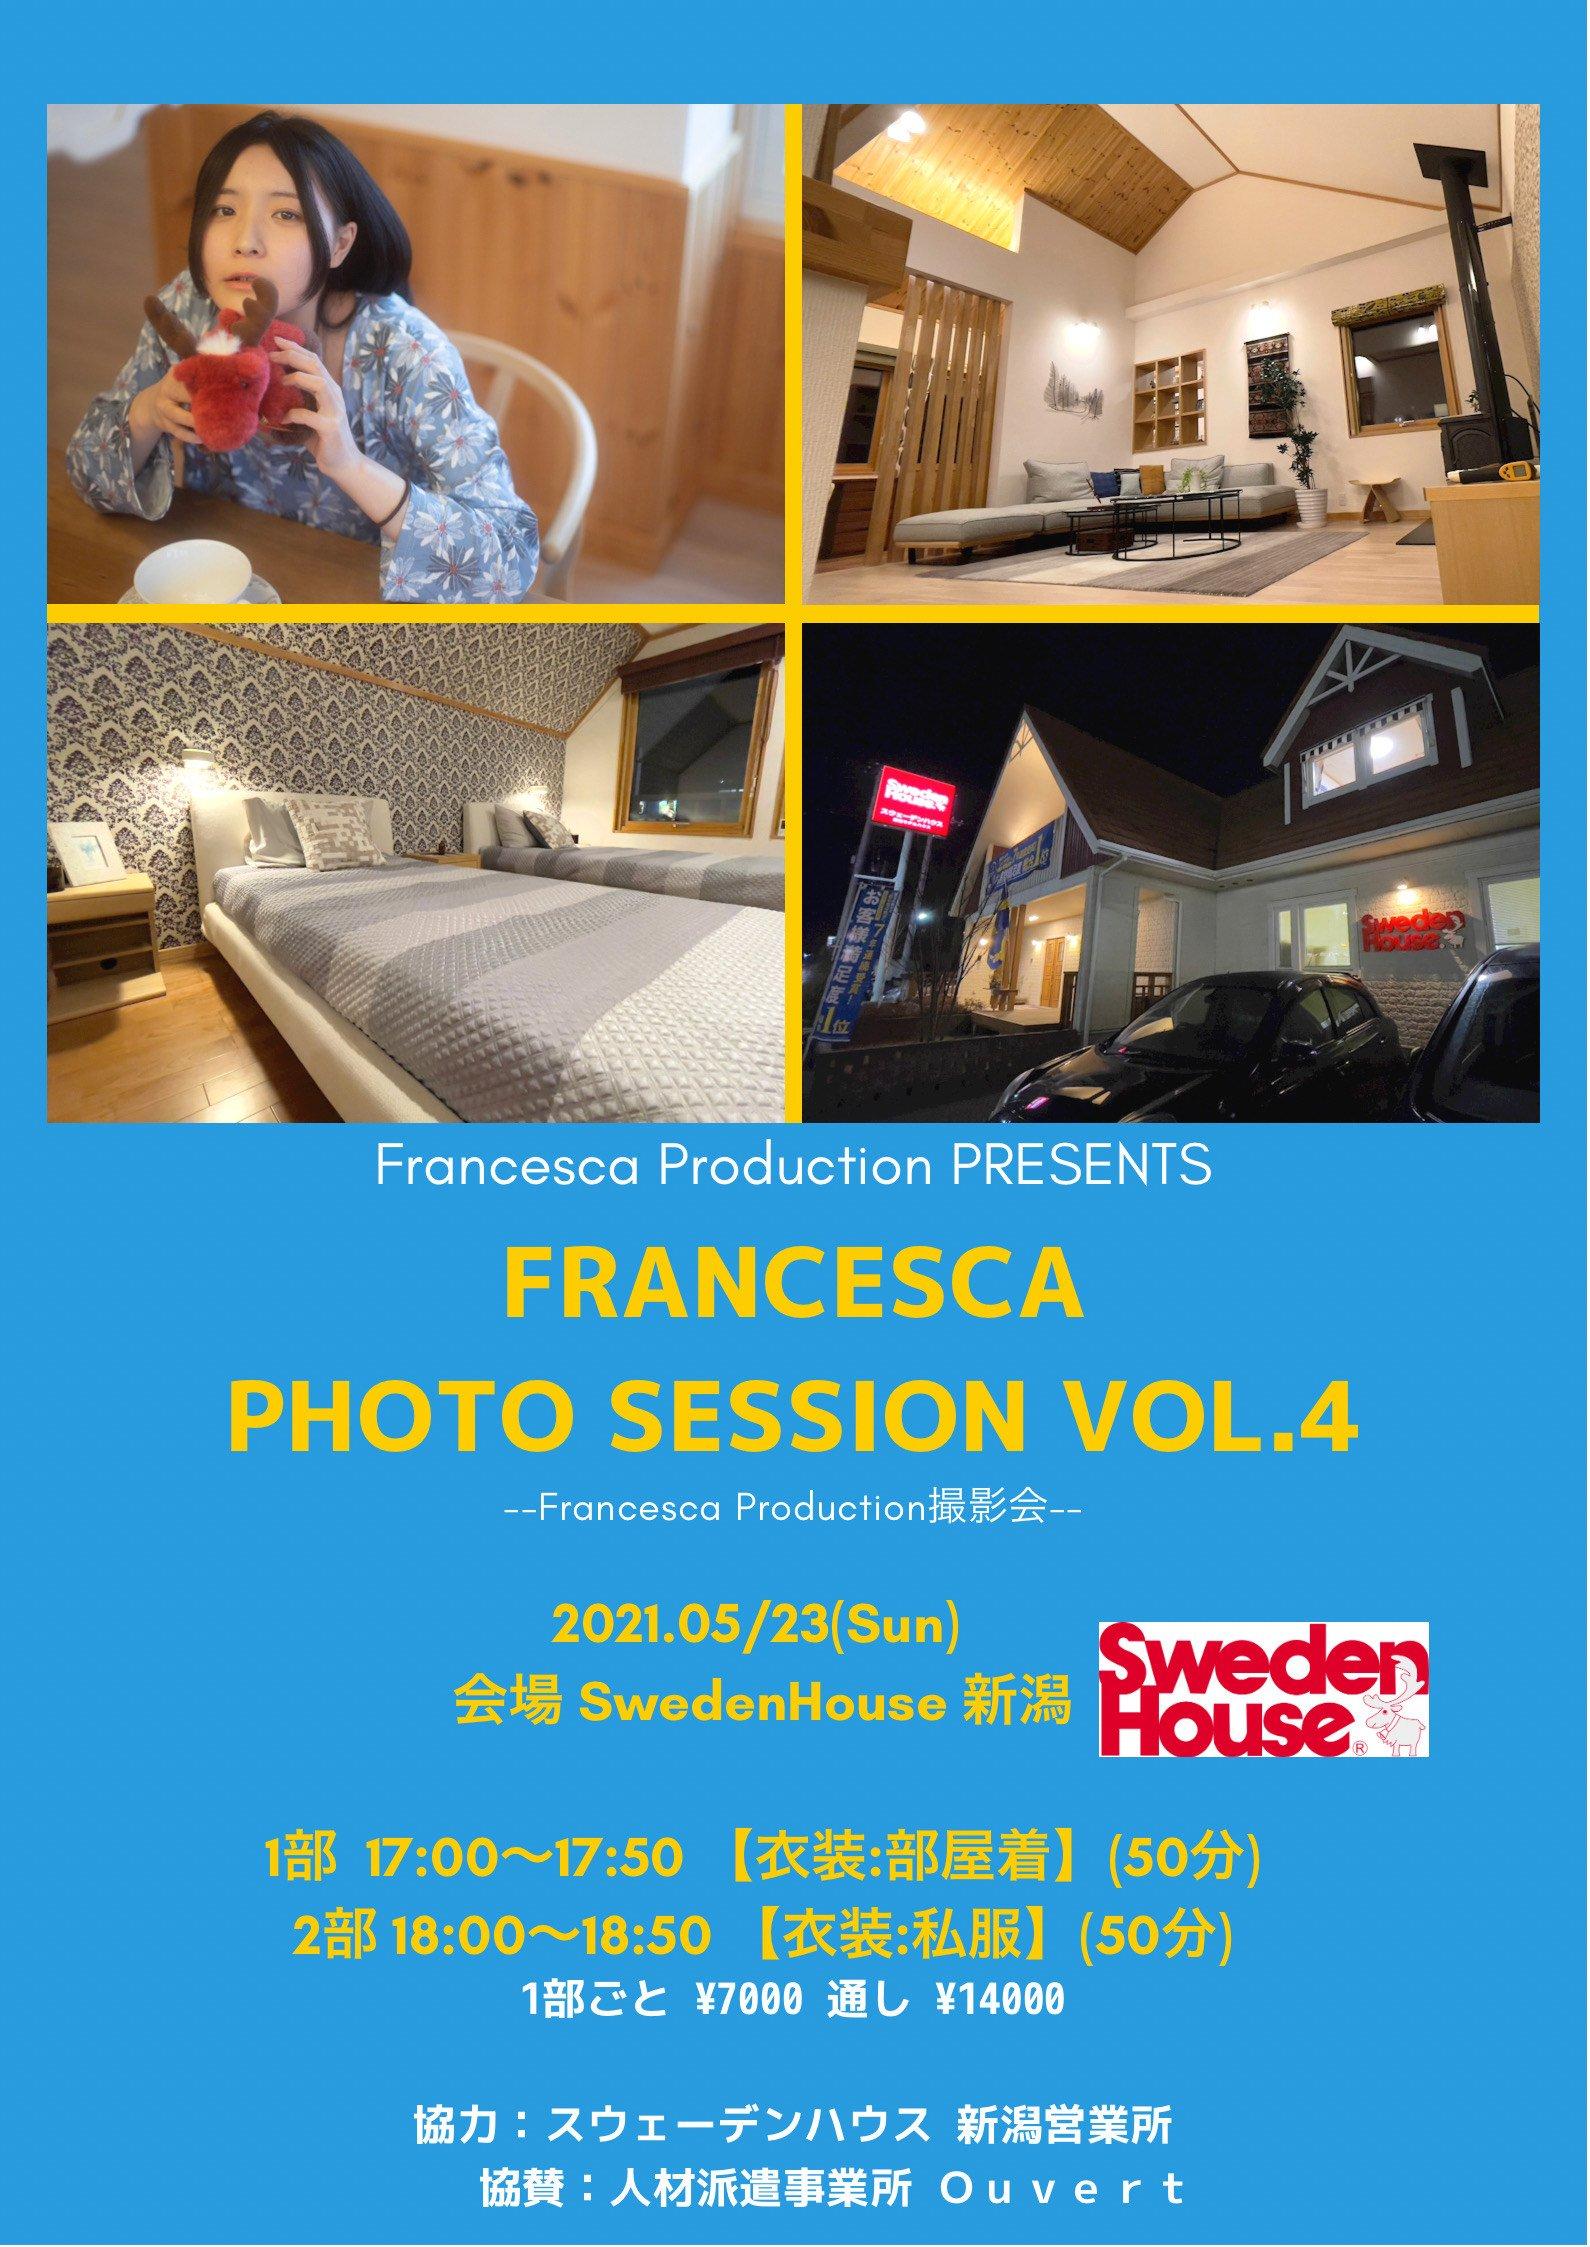 【5/23】Francesca Photo Session-Vol.4-【1部単位】のイメージその1